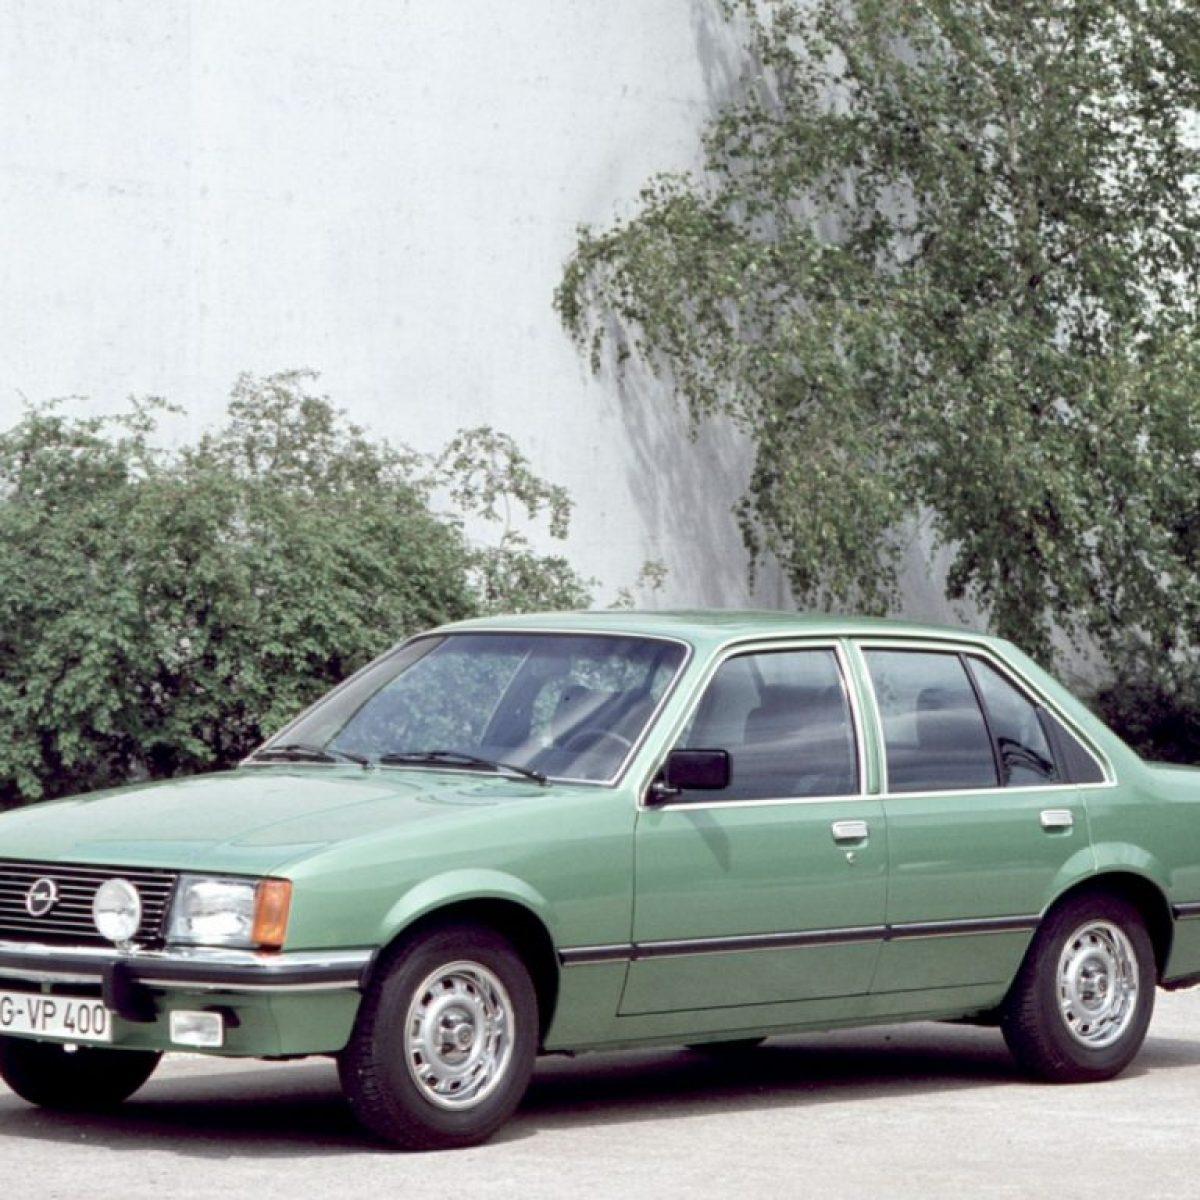 1977 a 1982 Opel Rekord E 77